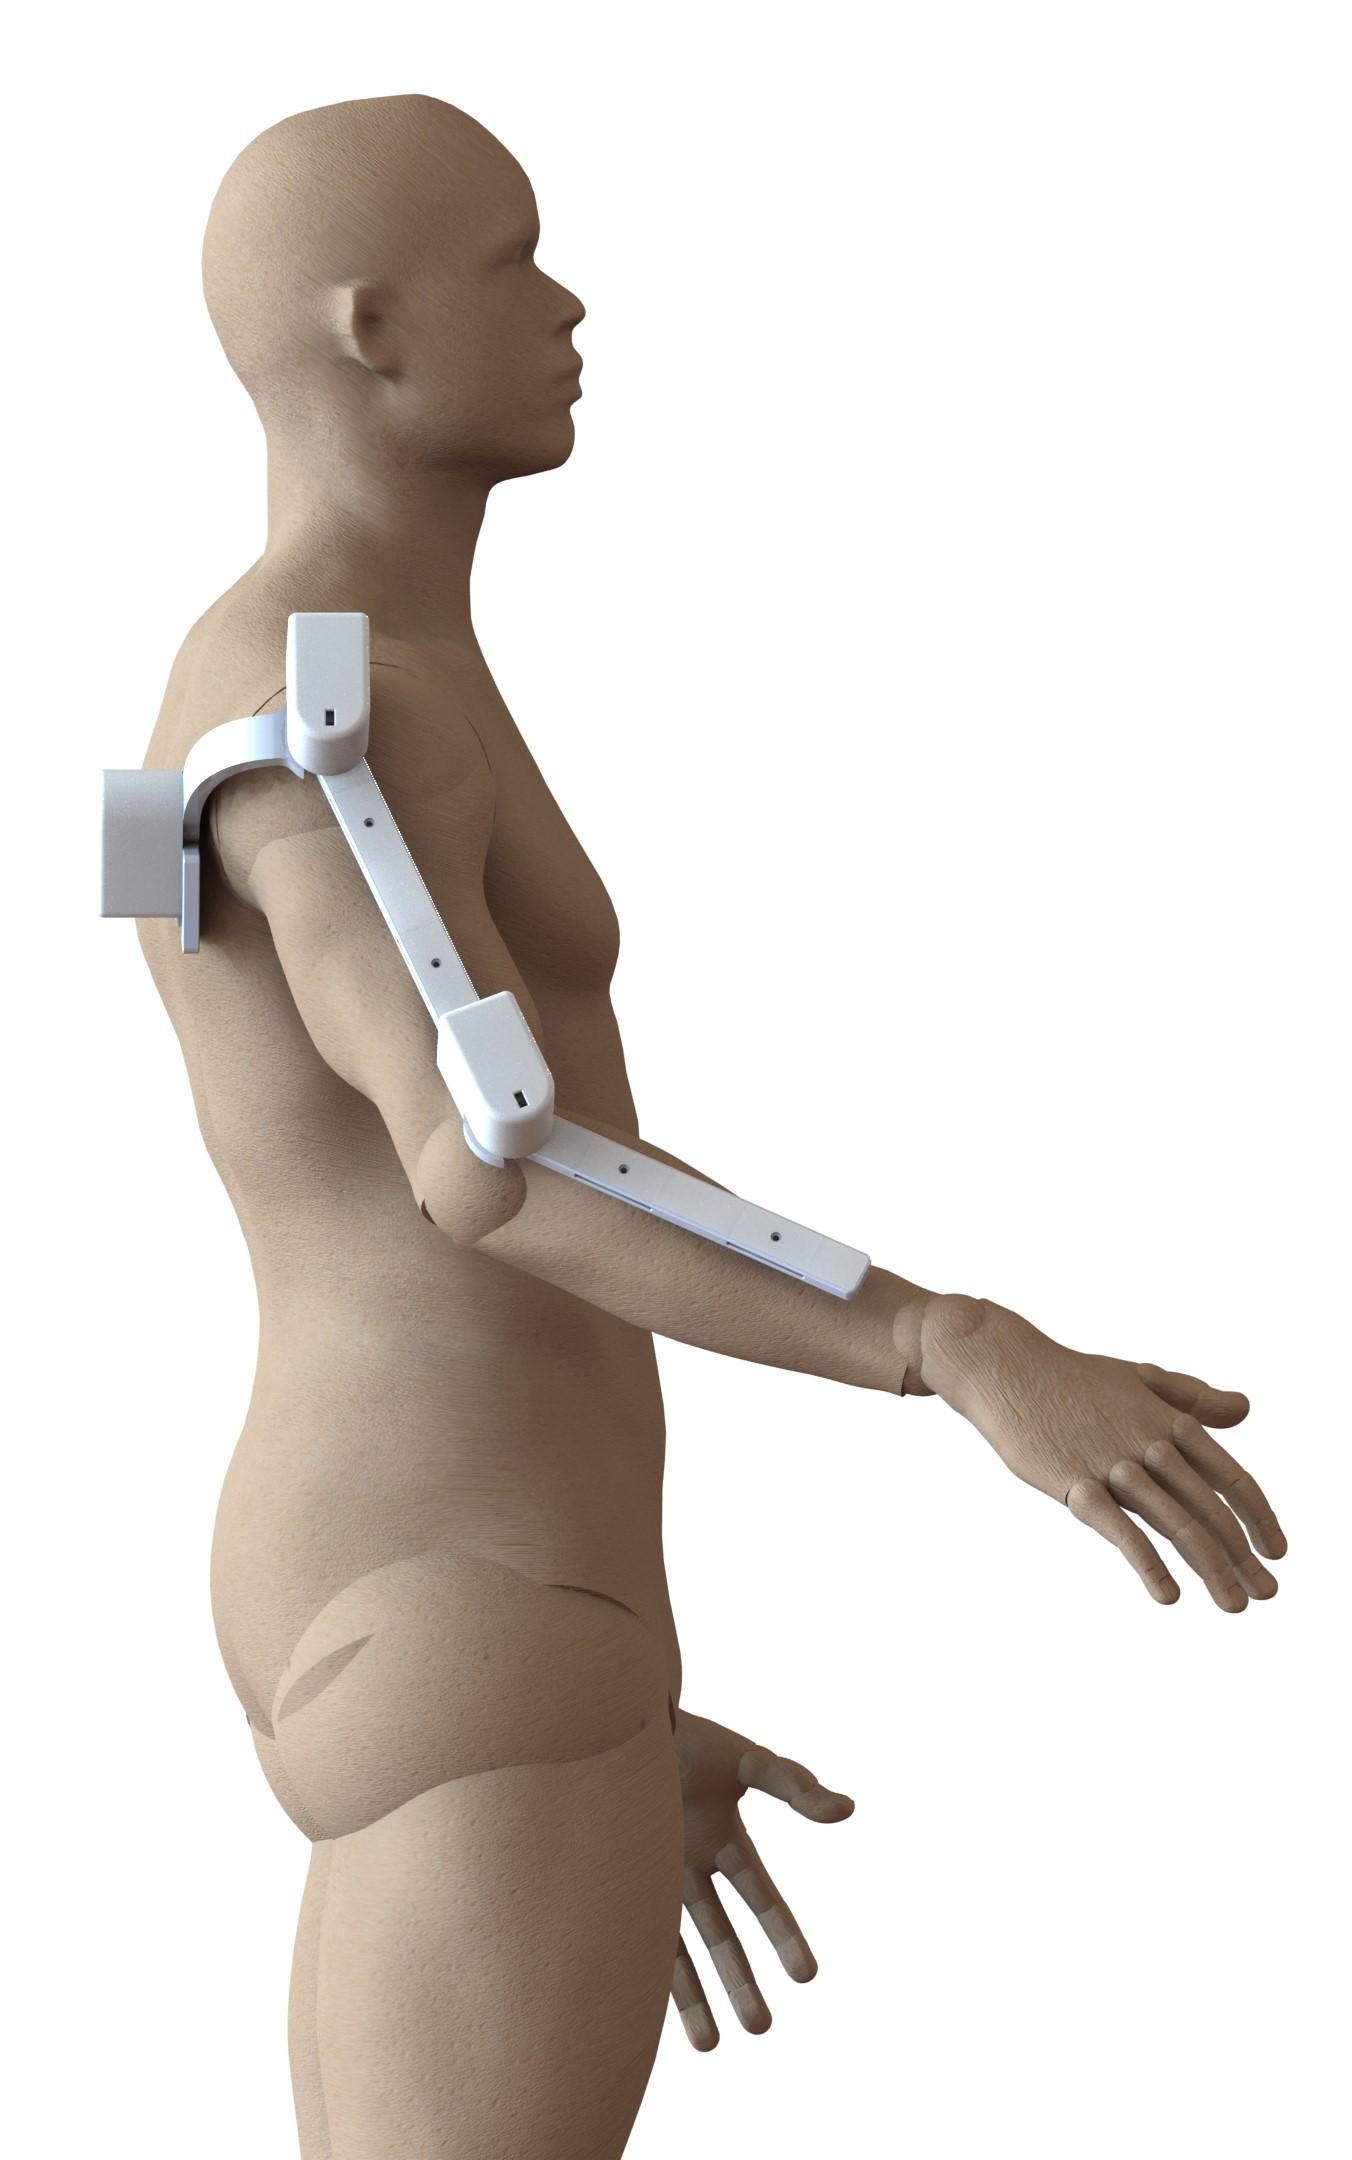 hubotics, Robotics for Human Beings